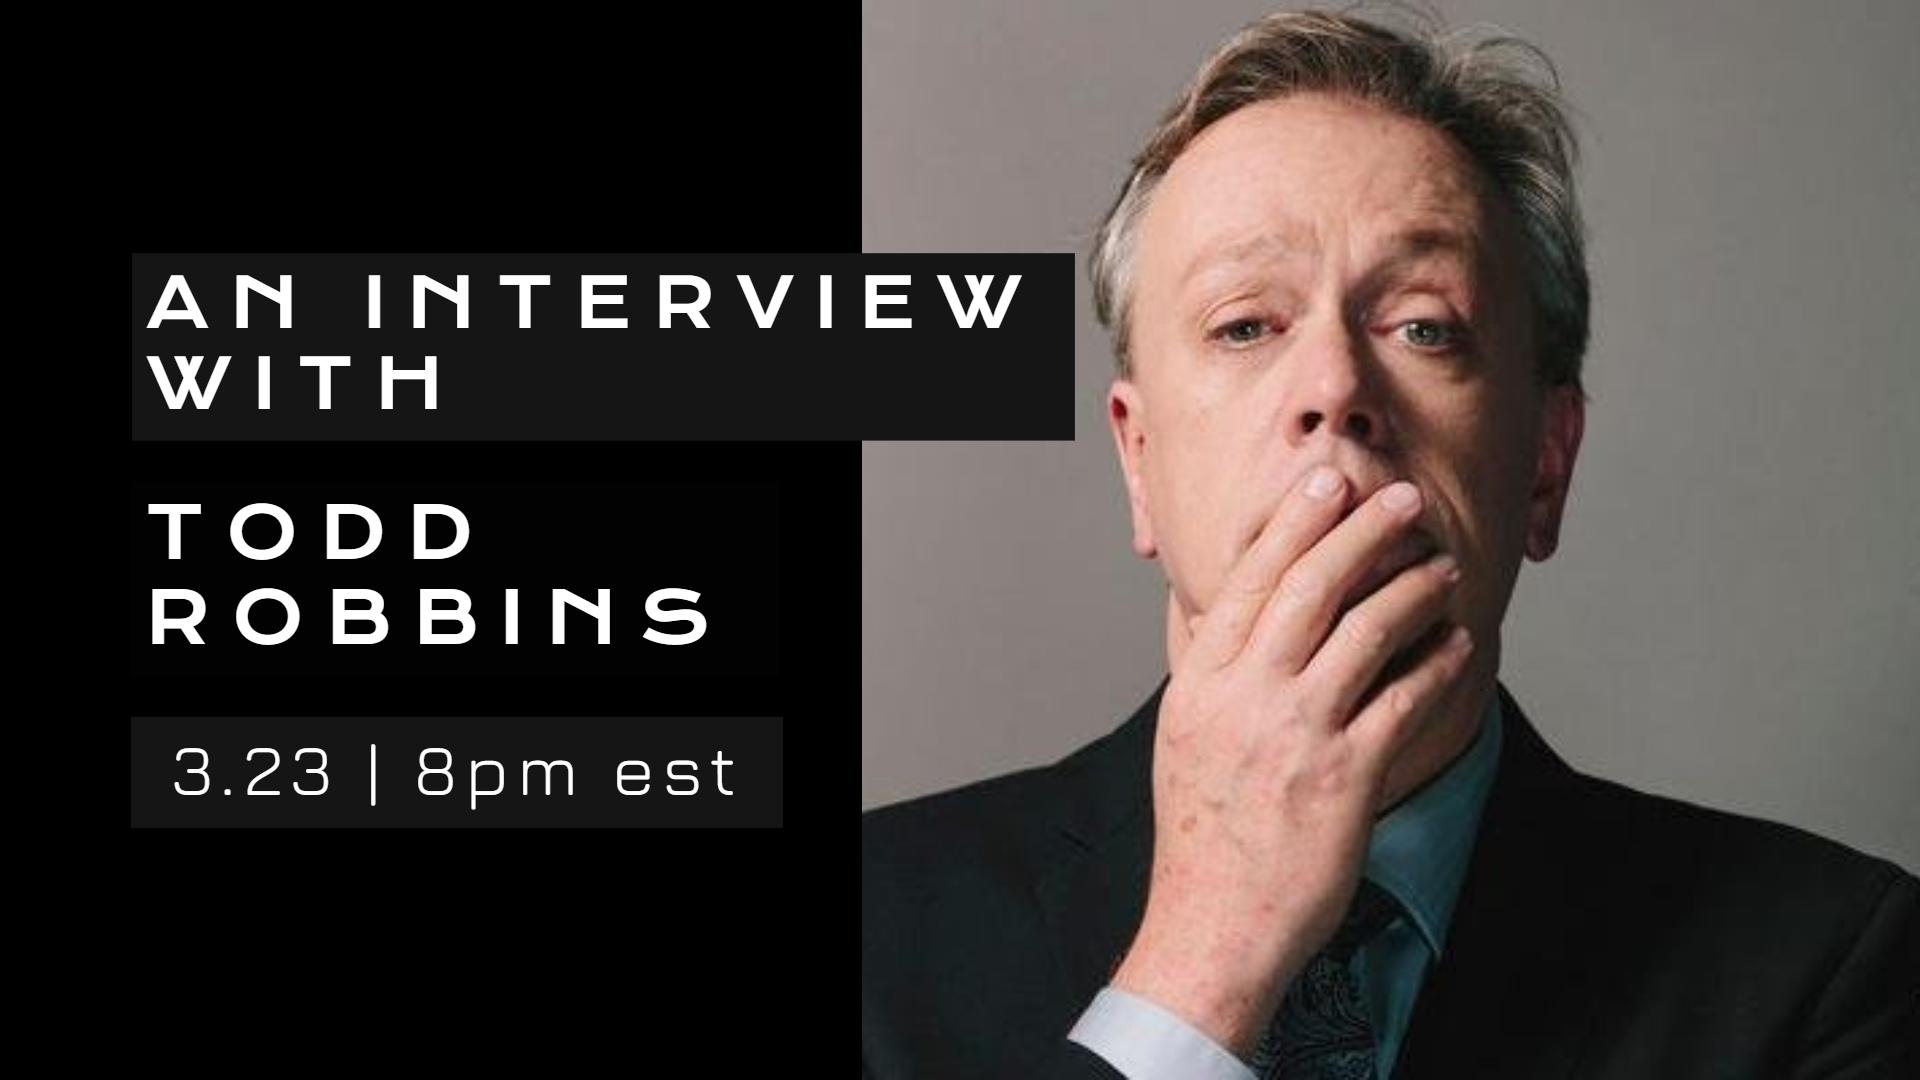 interviews todd robbins